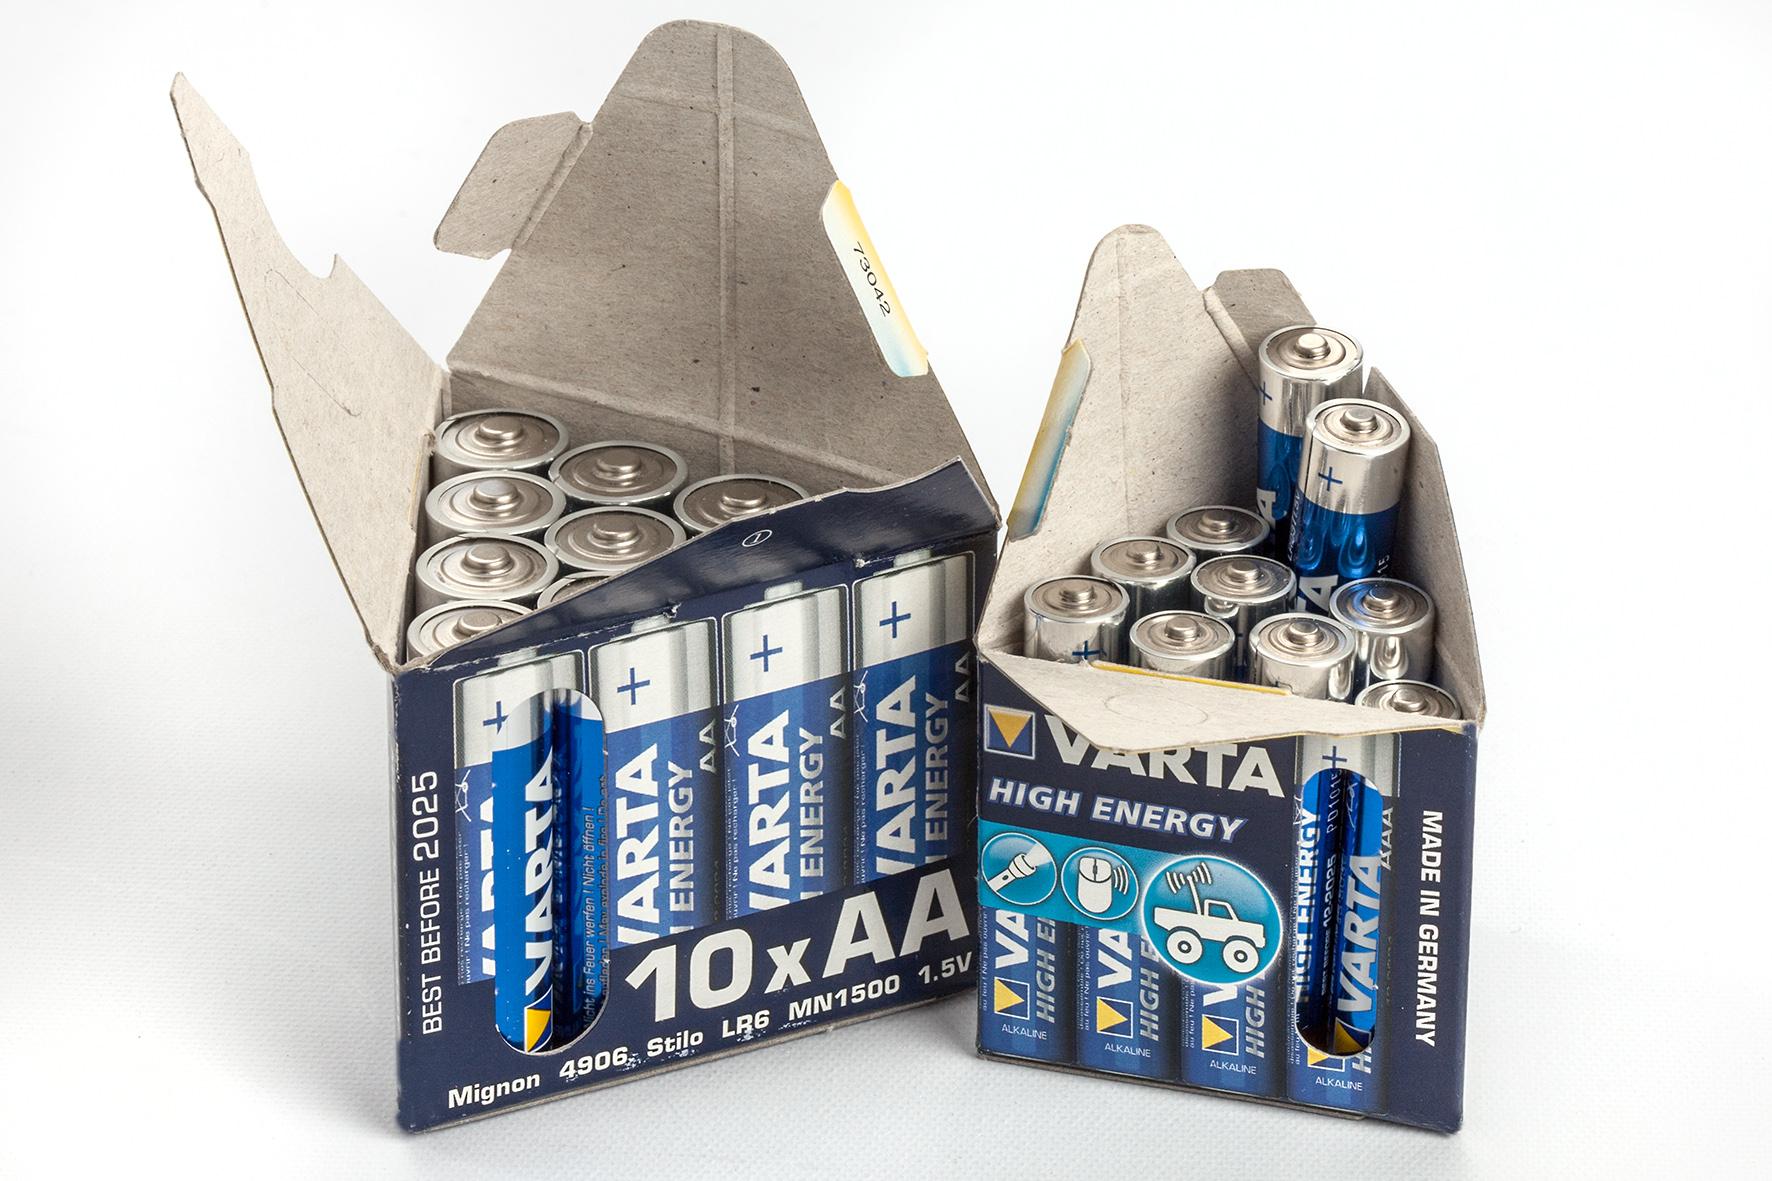 carton-award-image 129443